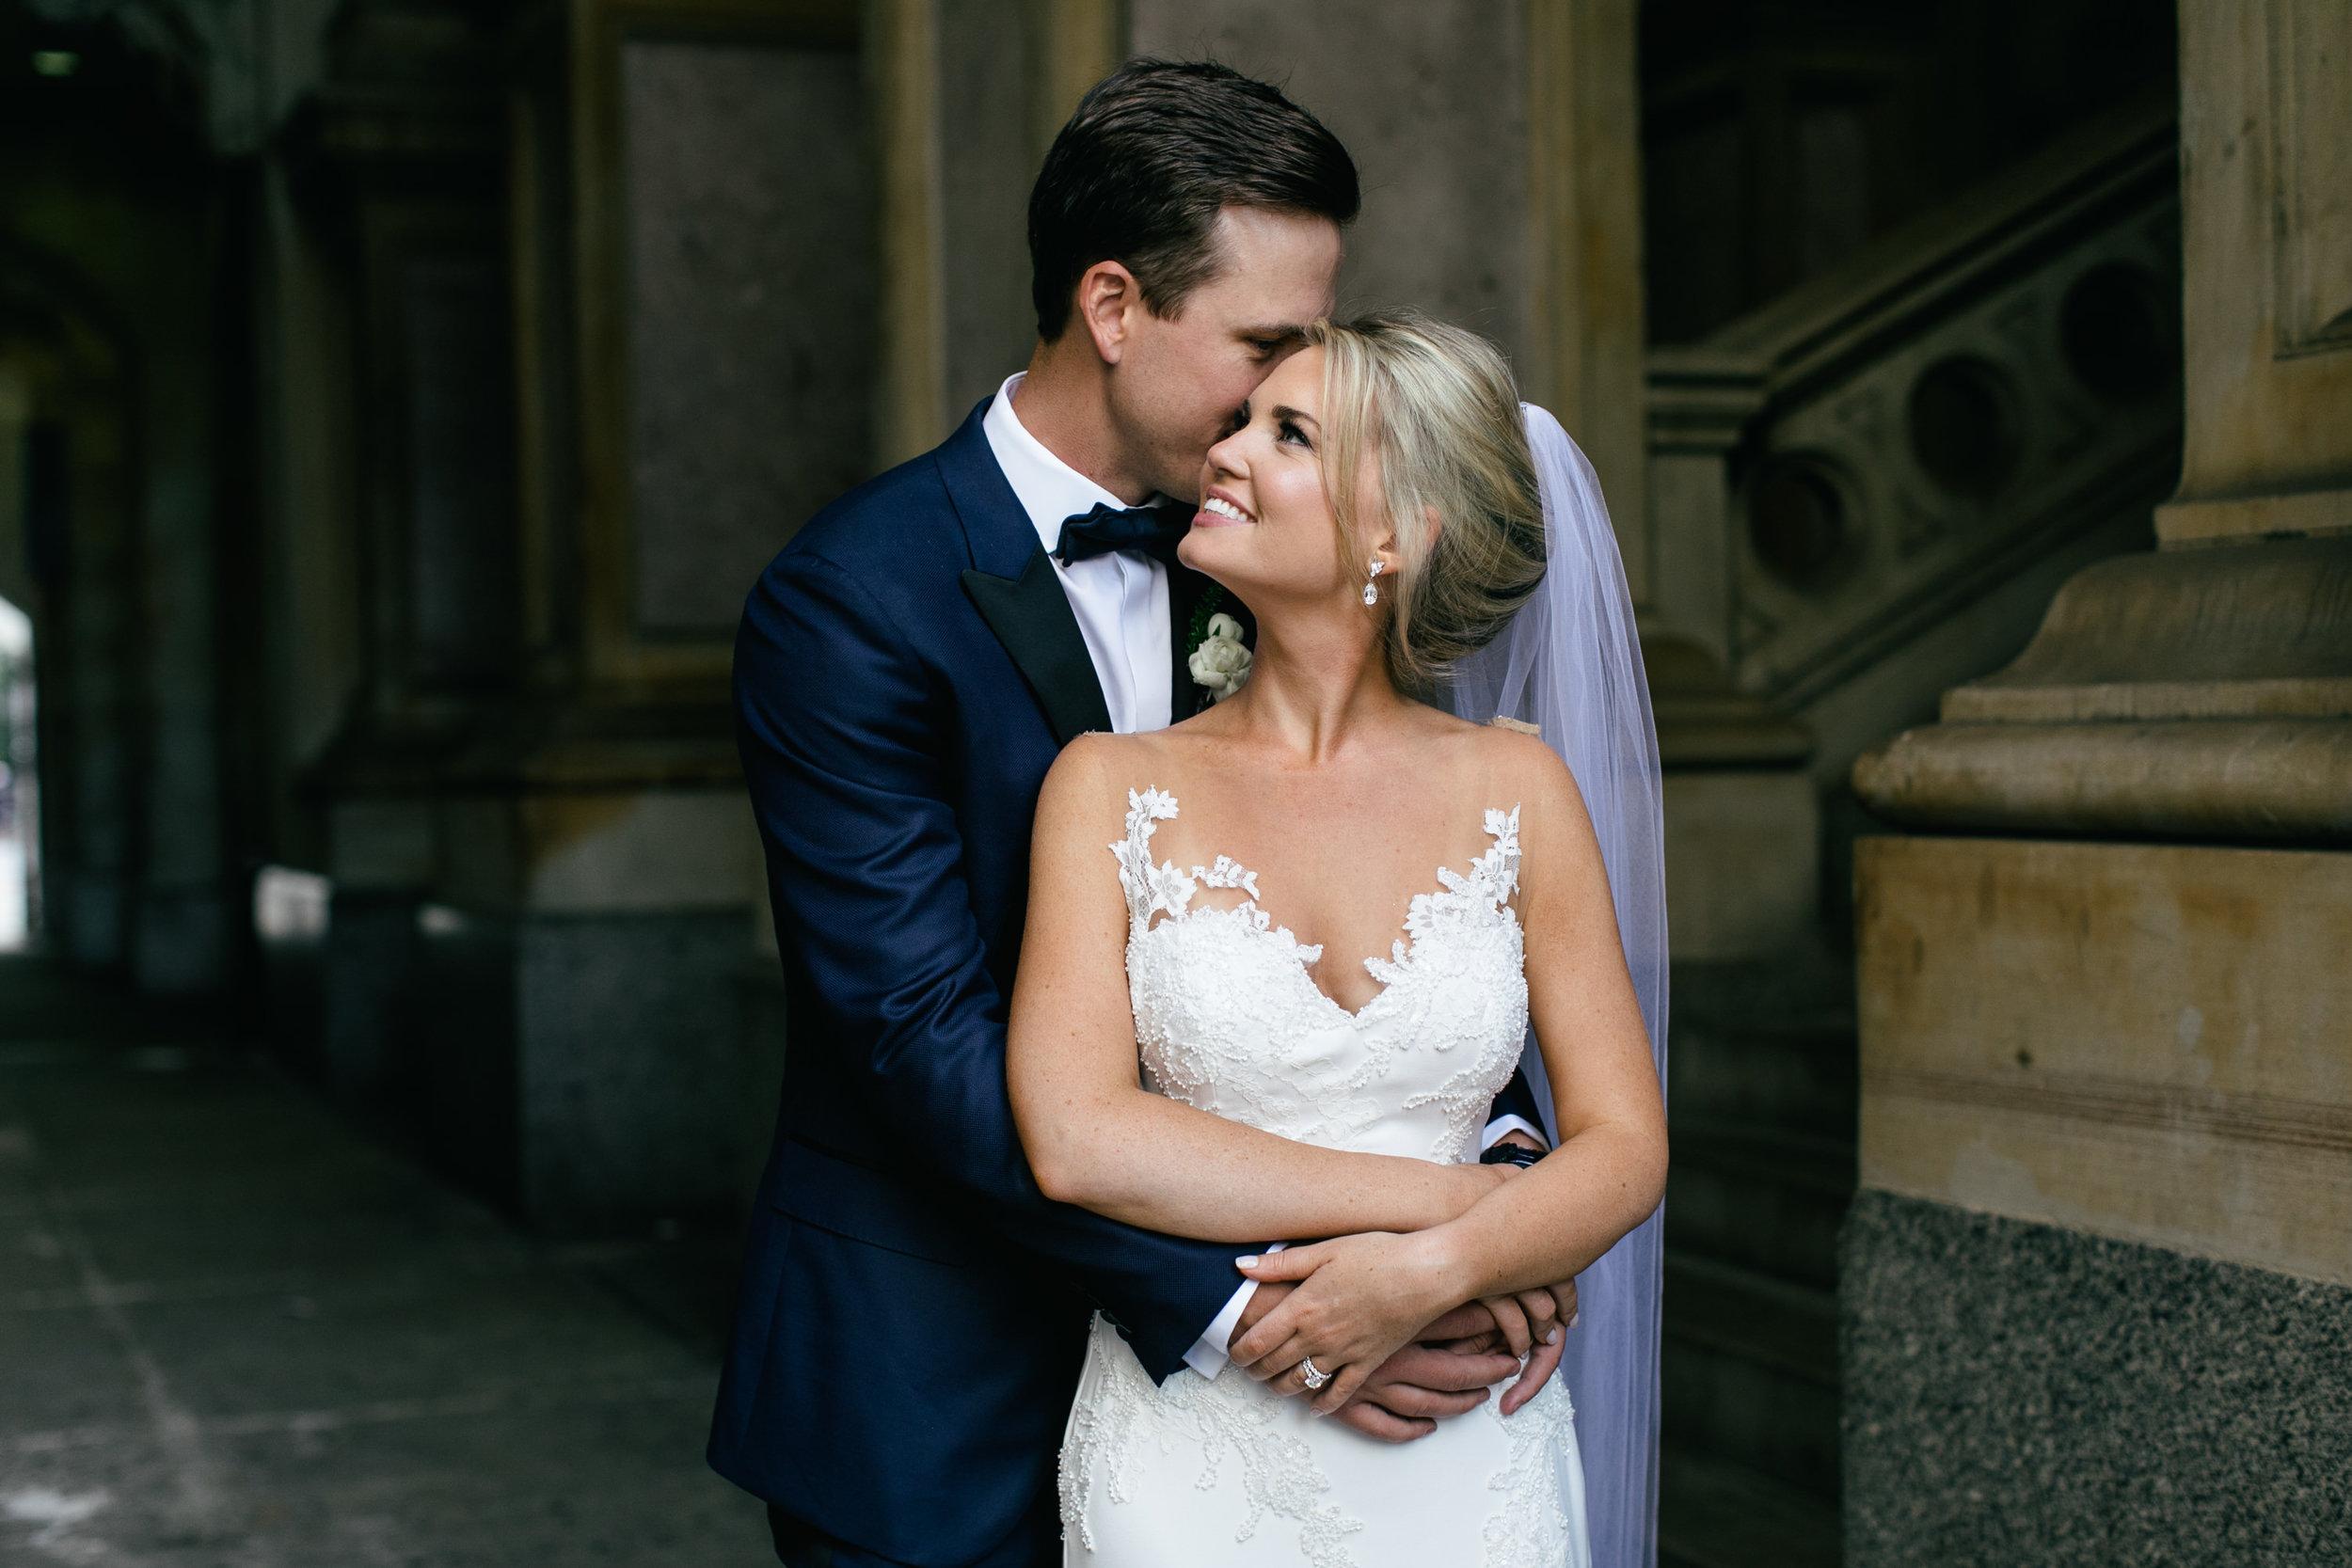 photography-wedding-weddings-natural-candid-union league-philadelphia-black tie-city hall-broad street-editorial-modern-fine-art-02.JPG